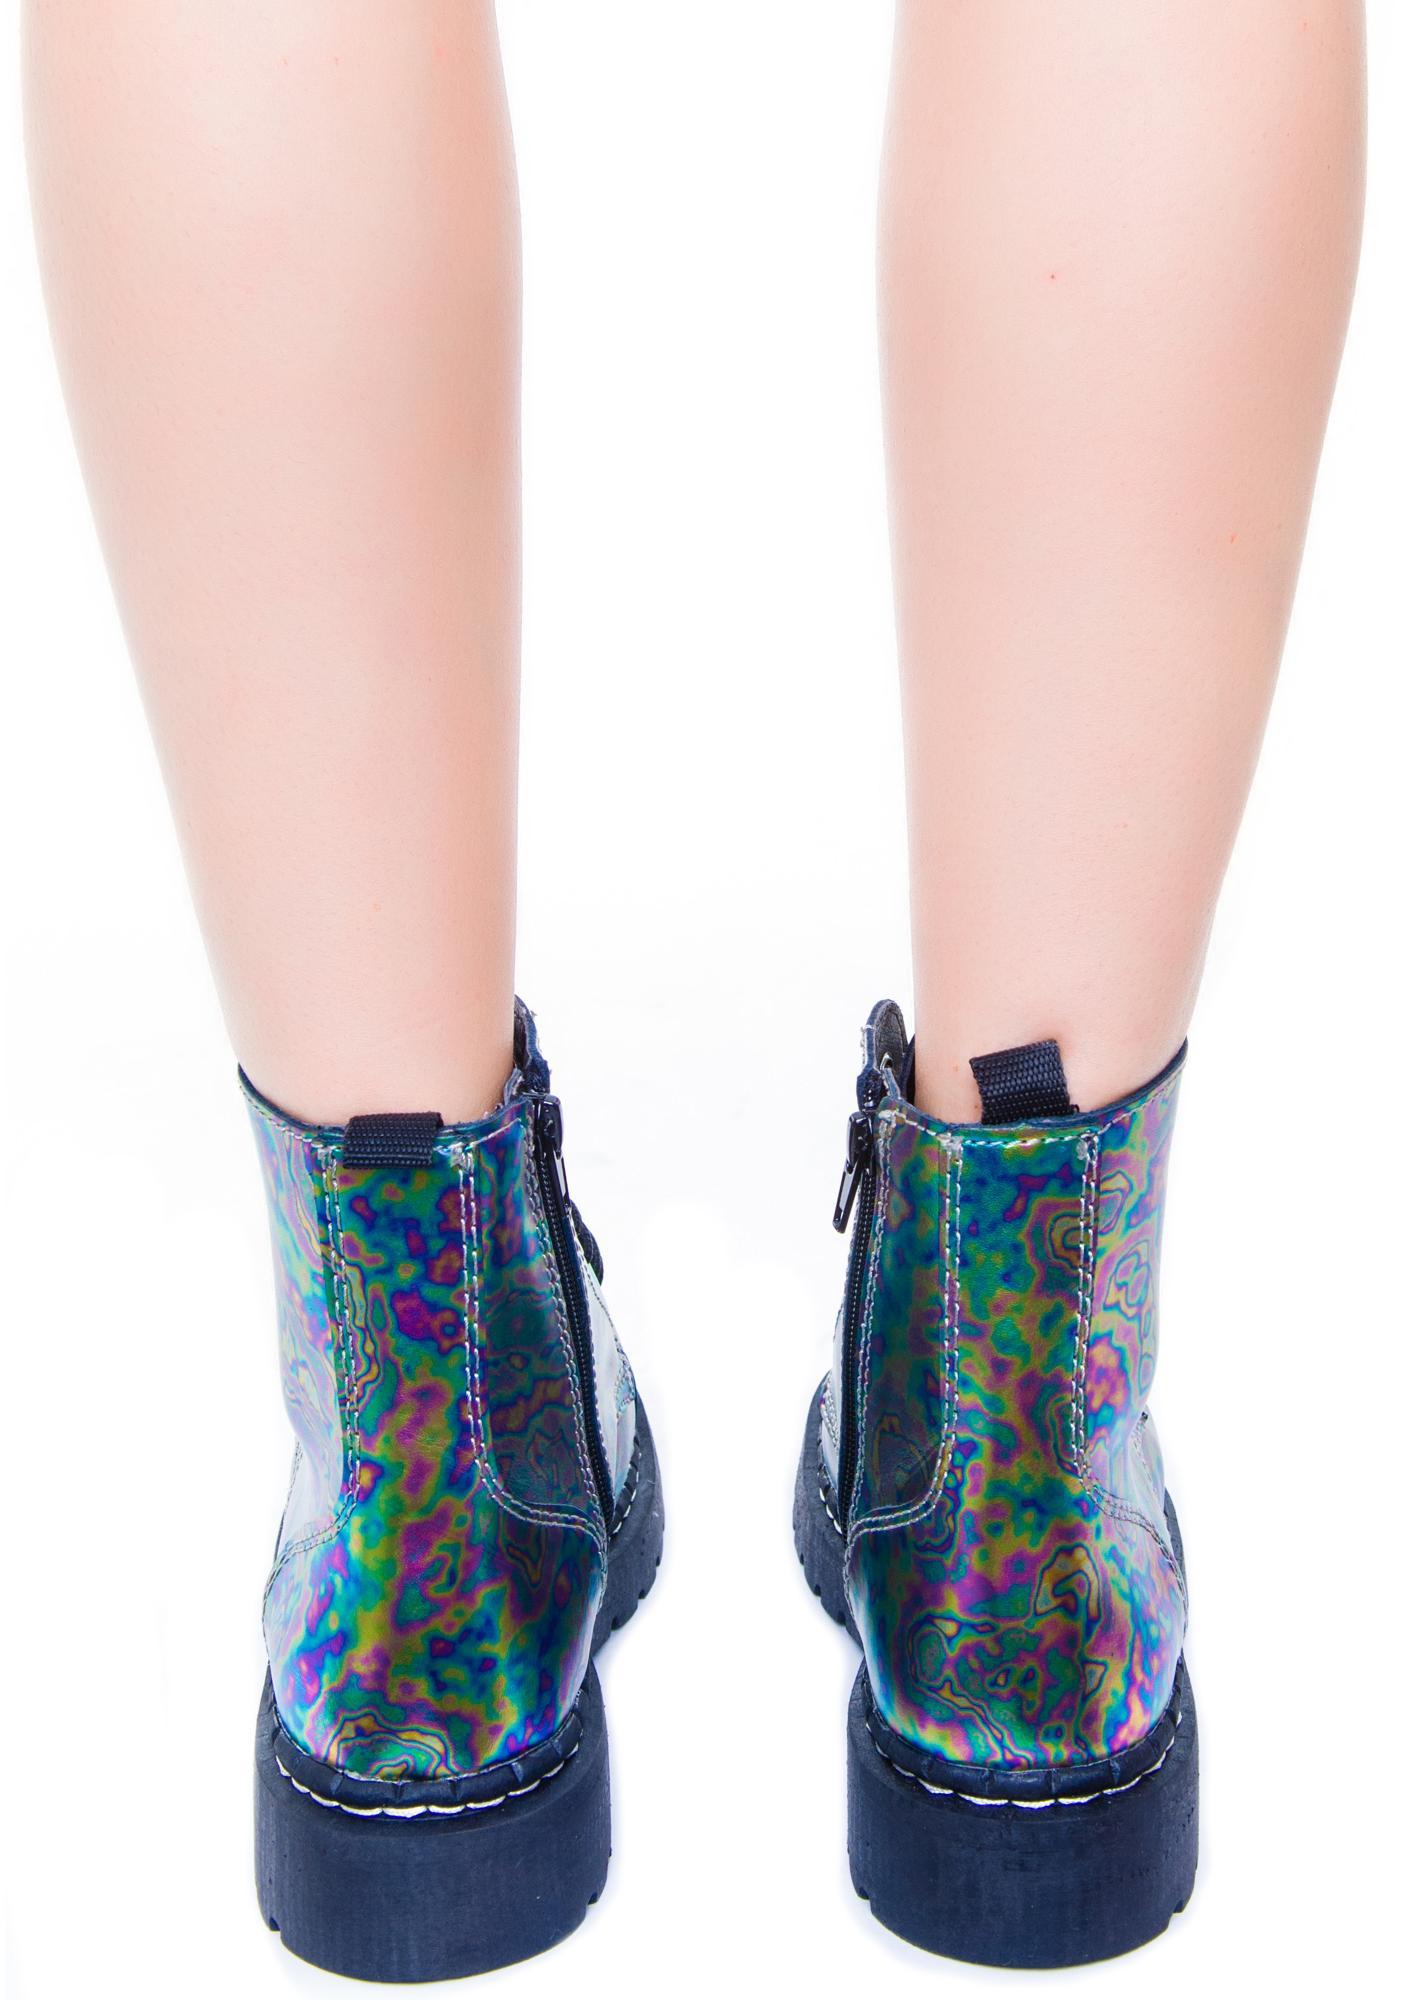 T.U.K. Oil Slick Leather 7 Eye Boot